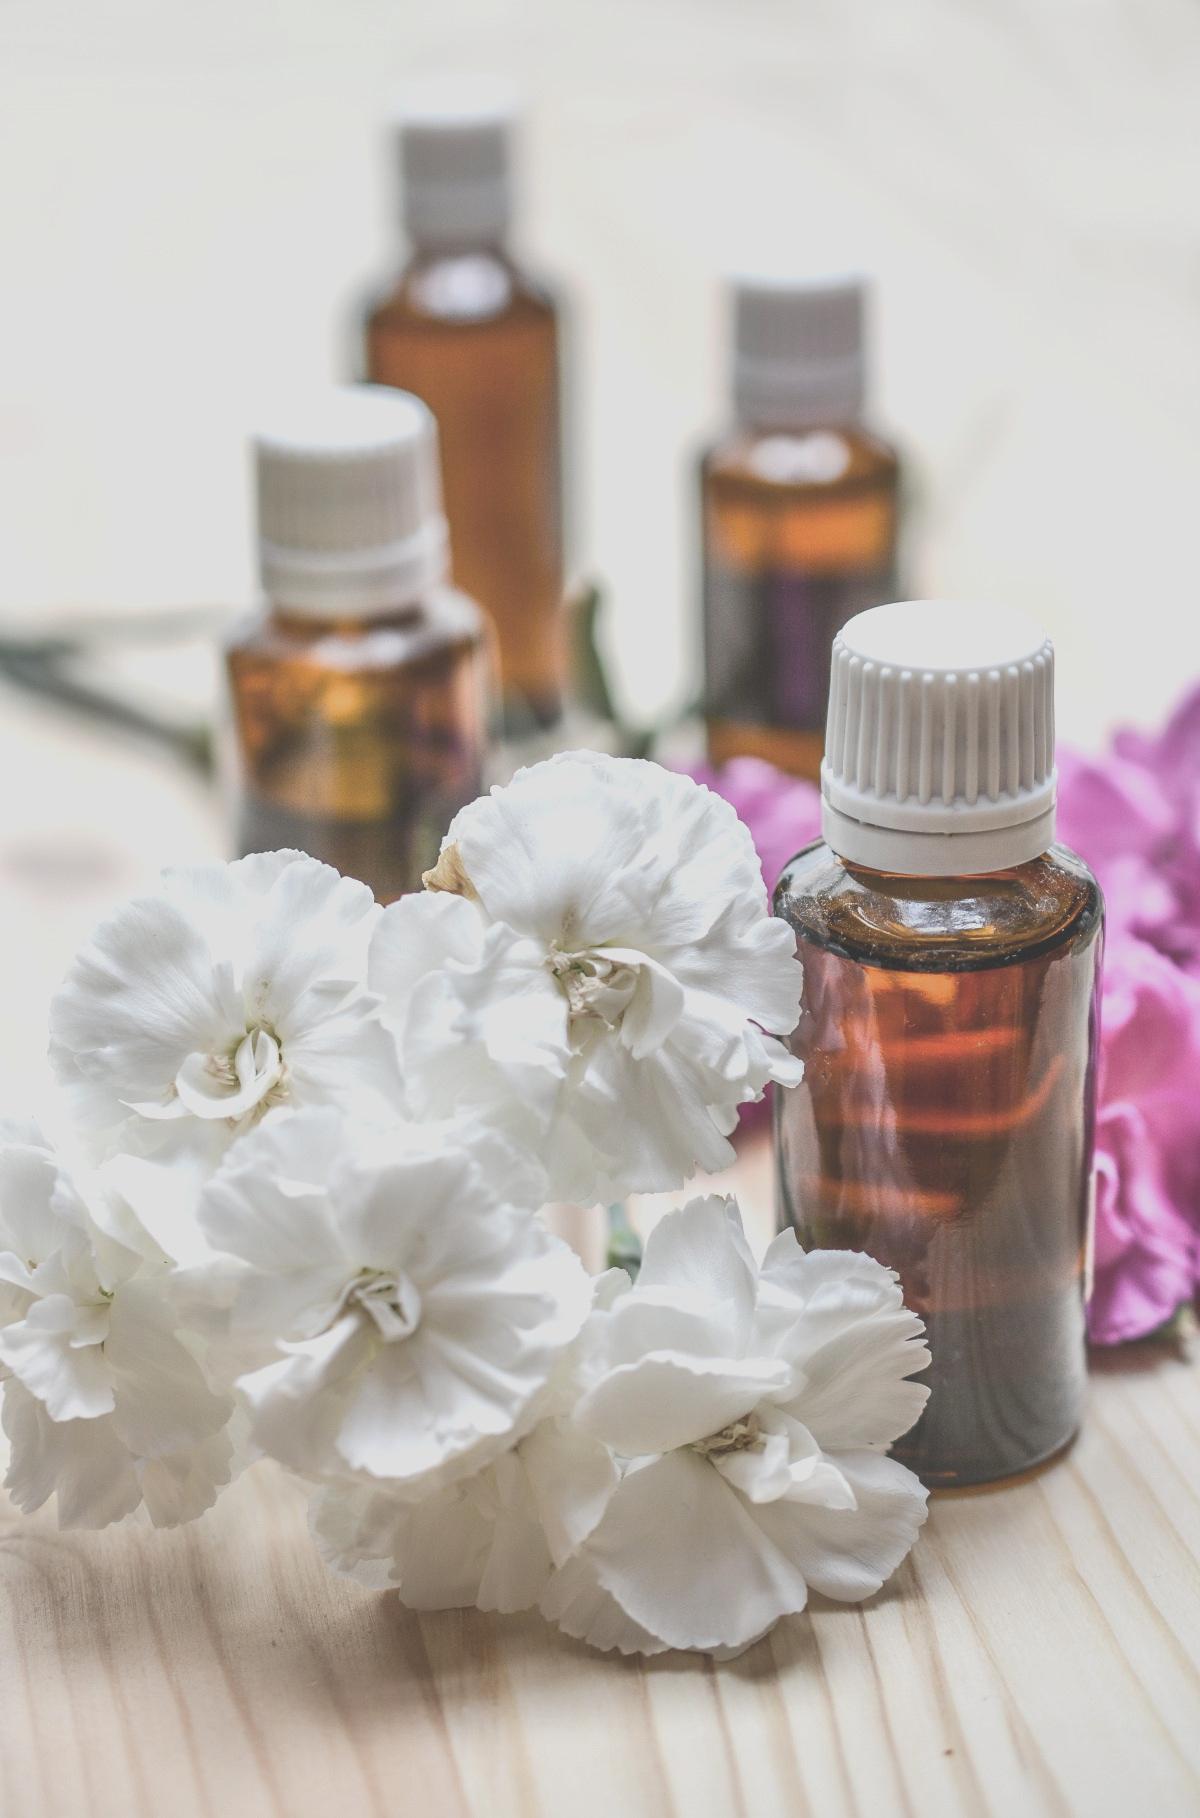 essential_oils_aromatherapy_spa_oil_essential_bottle_care_treatment-611731.jpg%21d.jpg